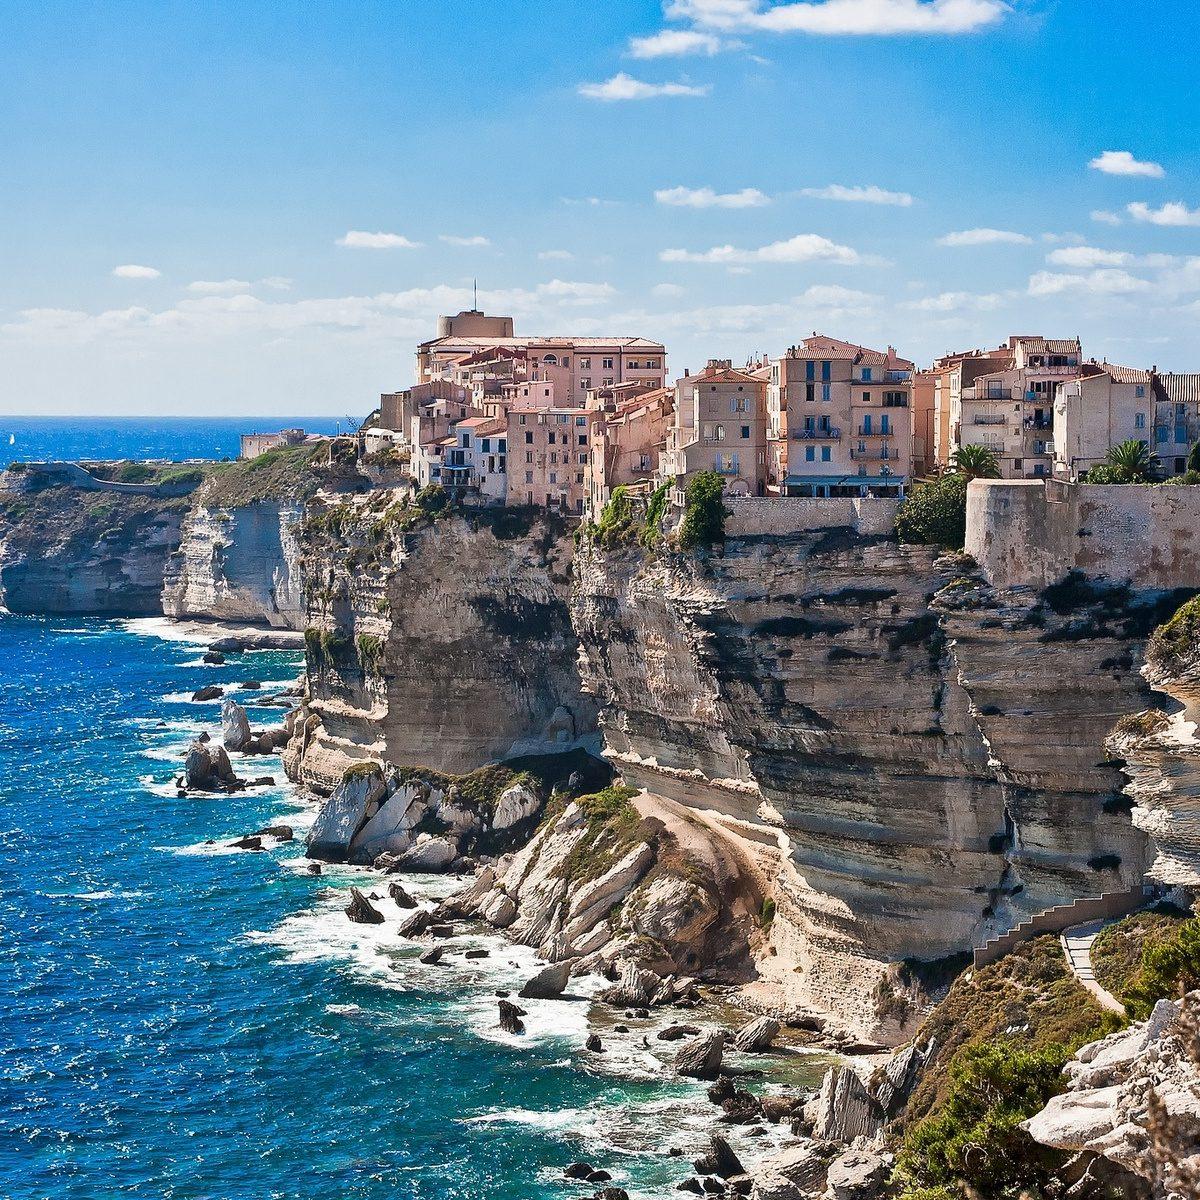 FRANCE - Corsica (Napoleon's Island)